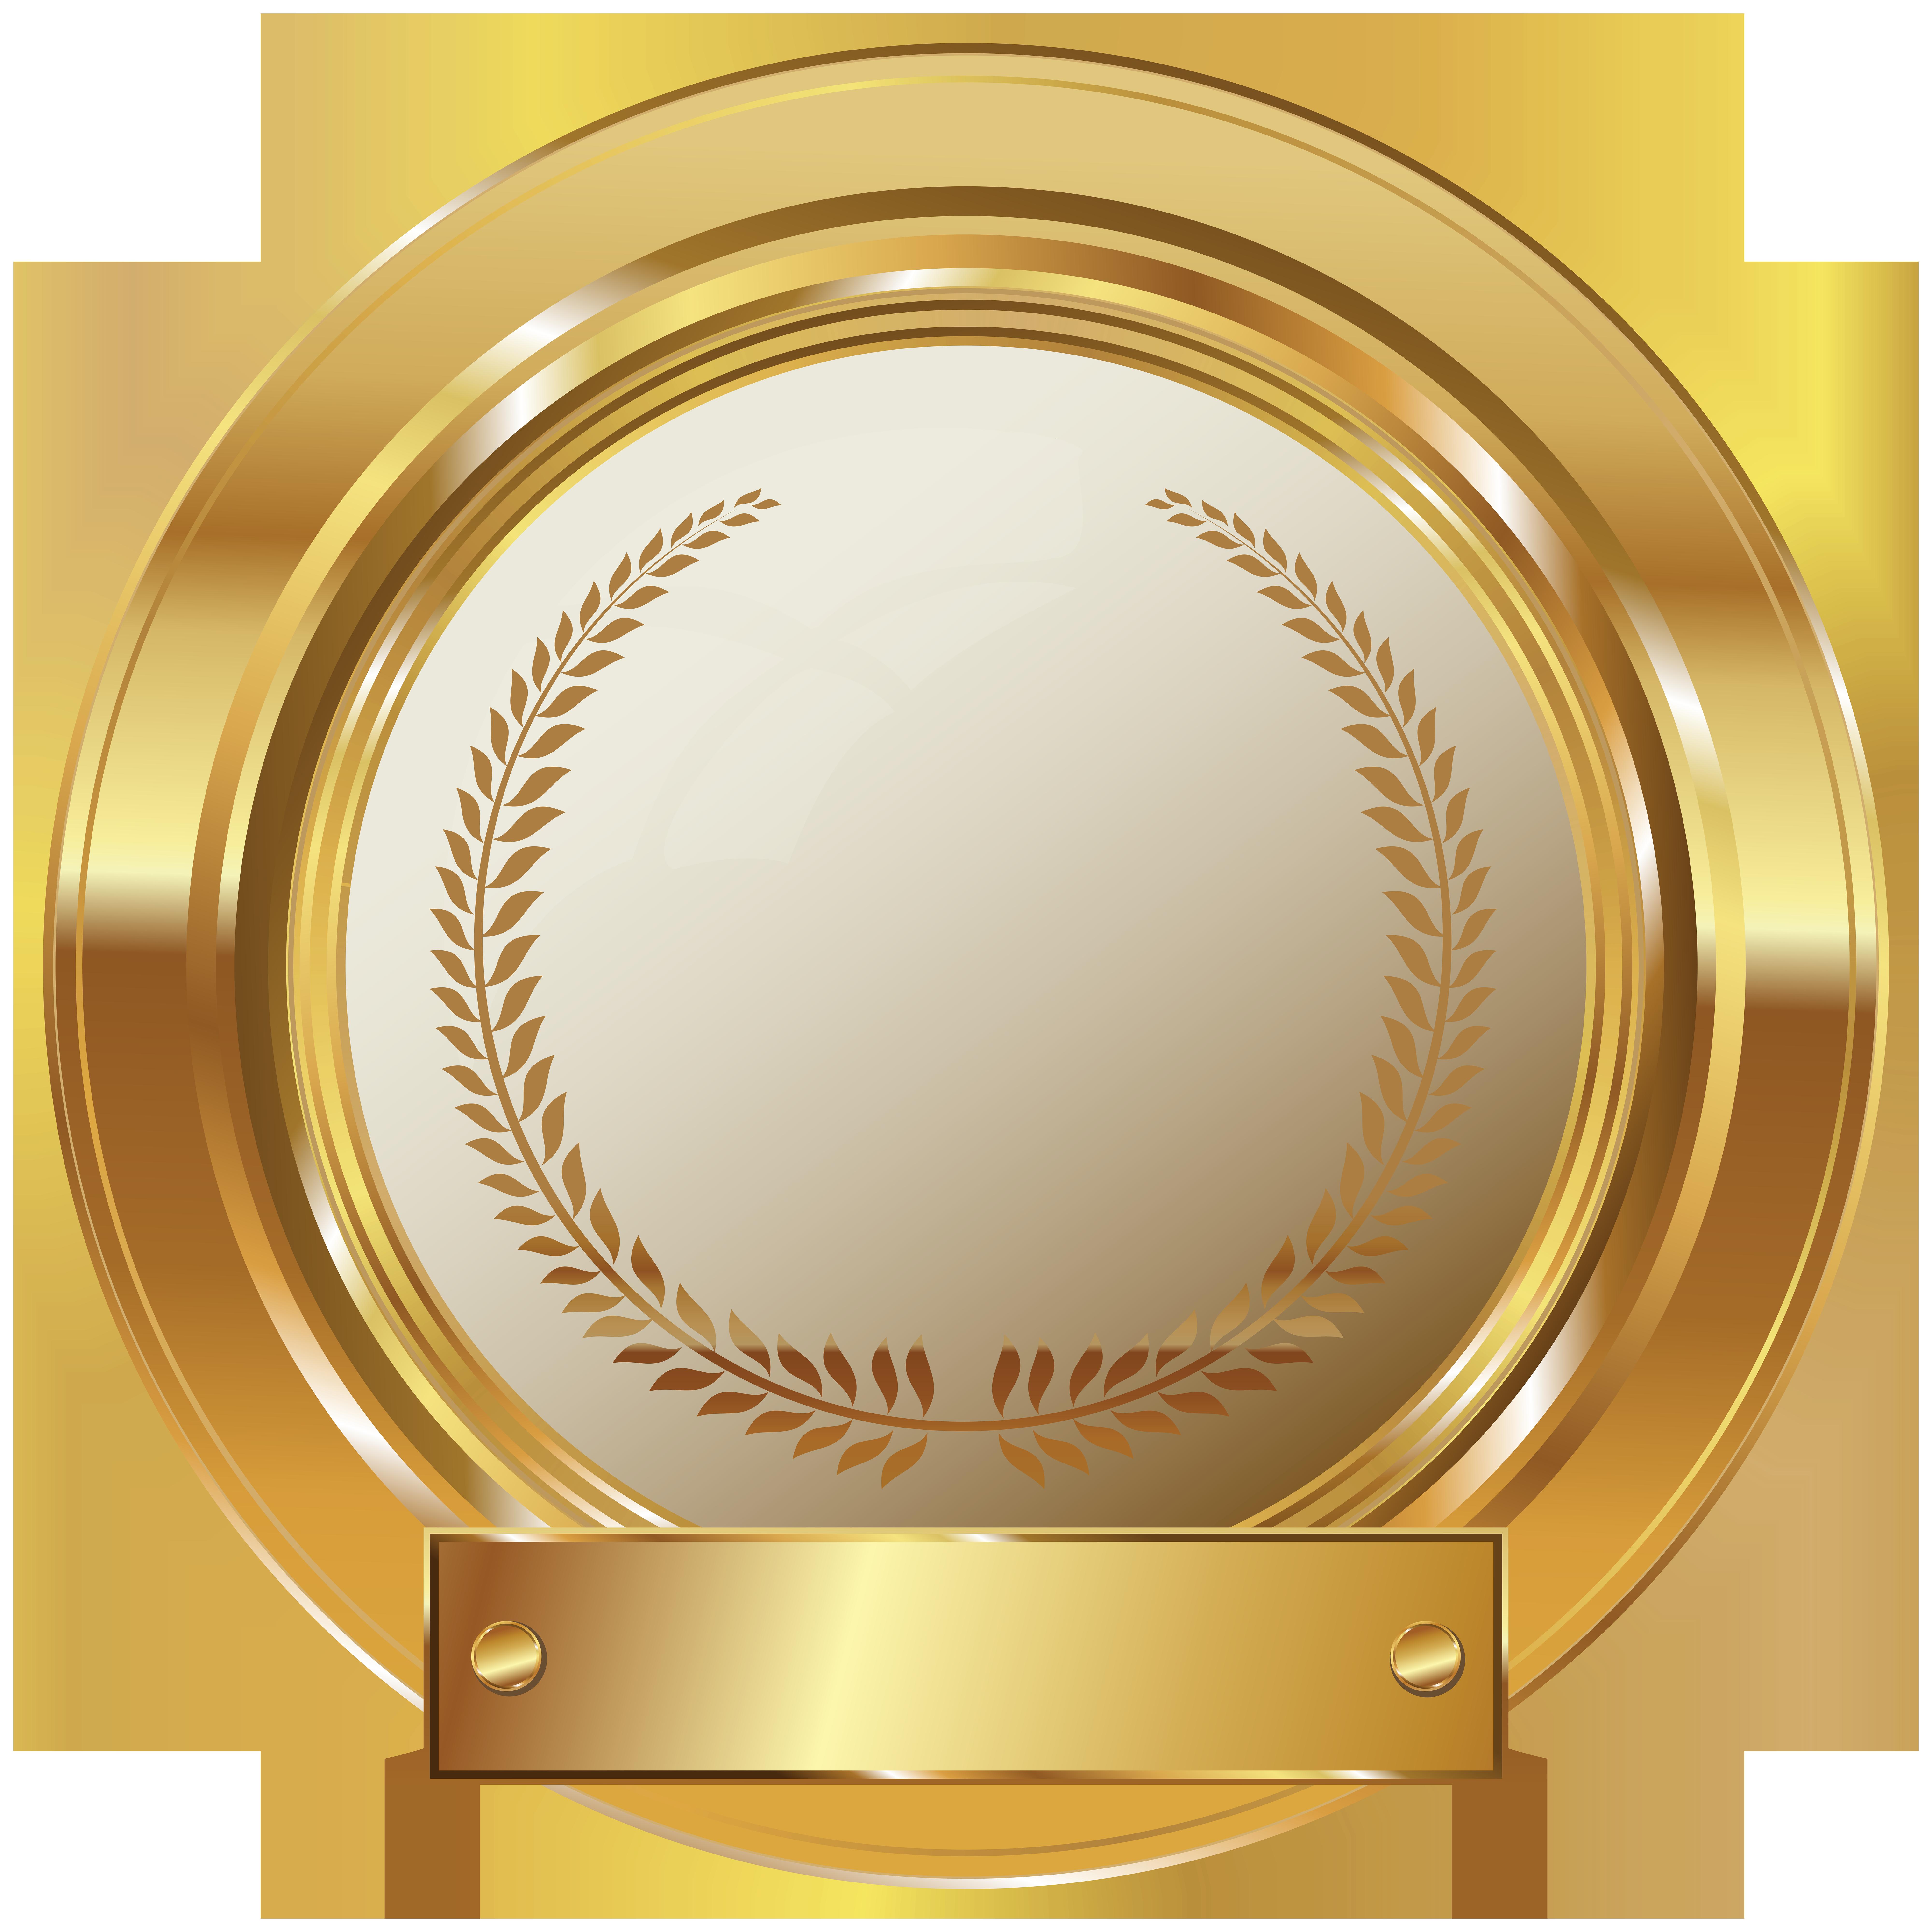 Gold Seal PNG Clip Art Image.